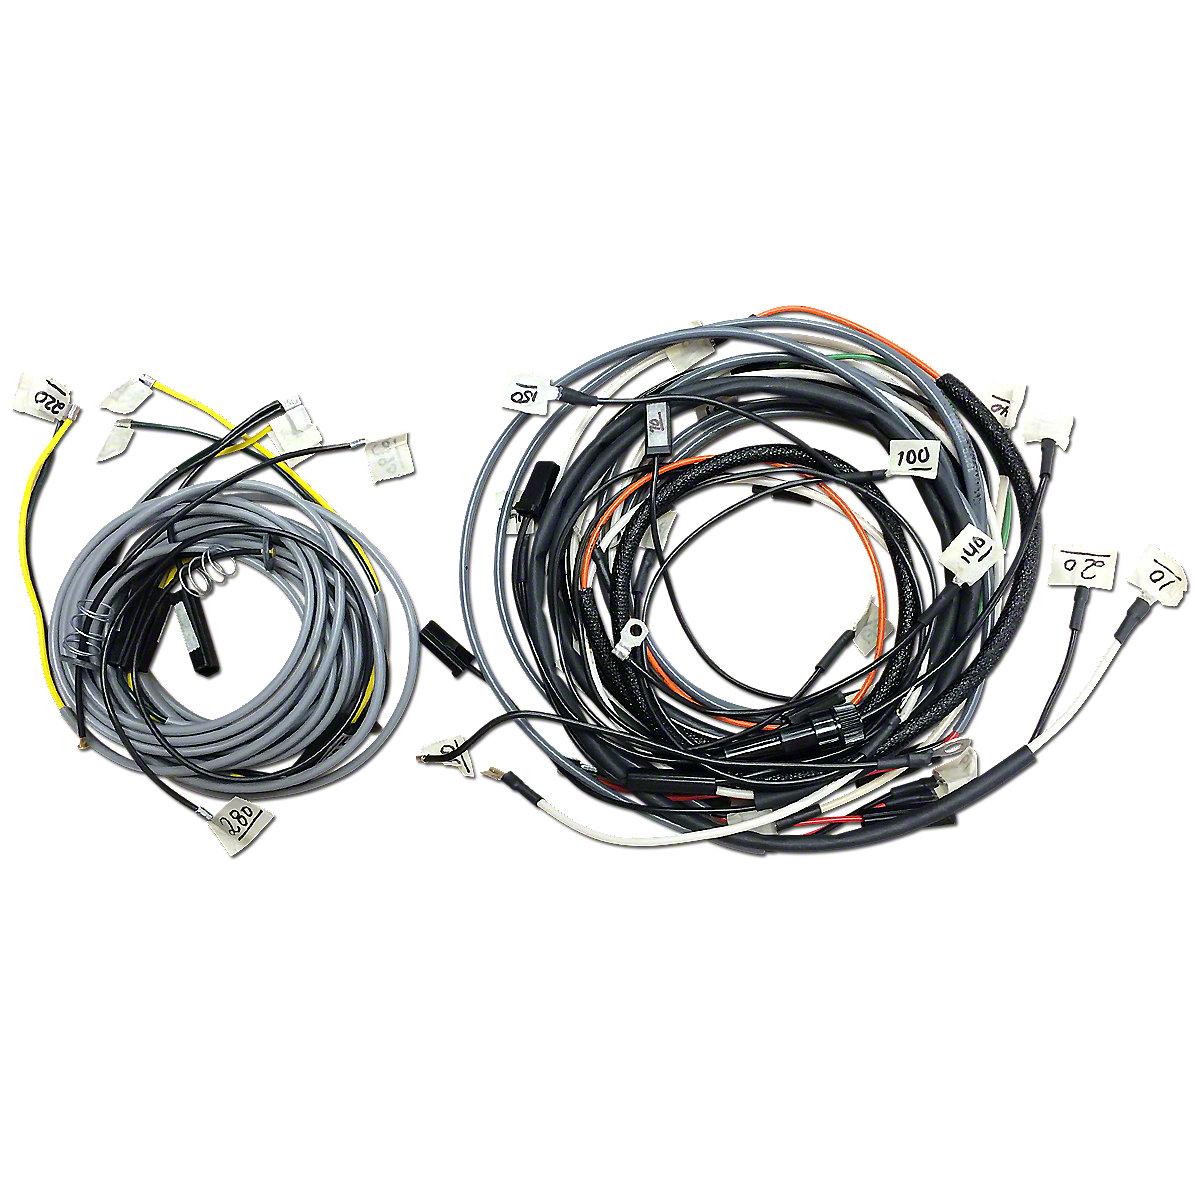 Wiring Harness Kit Jds2883